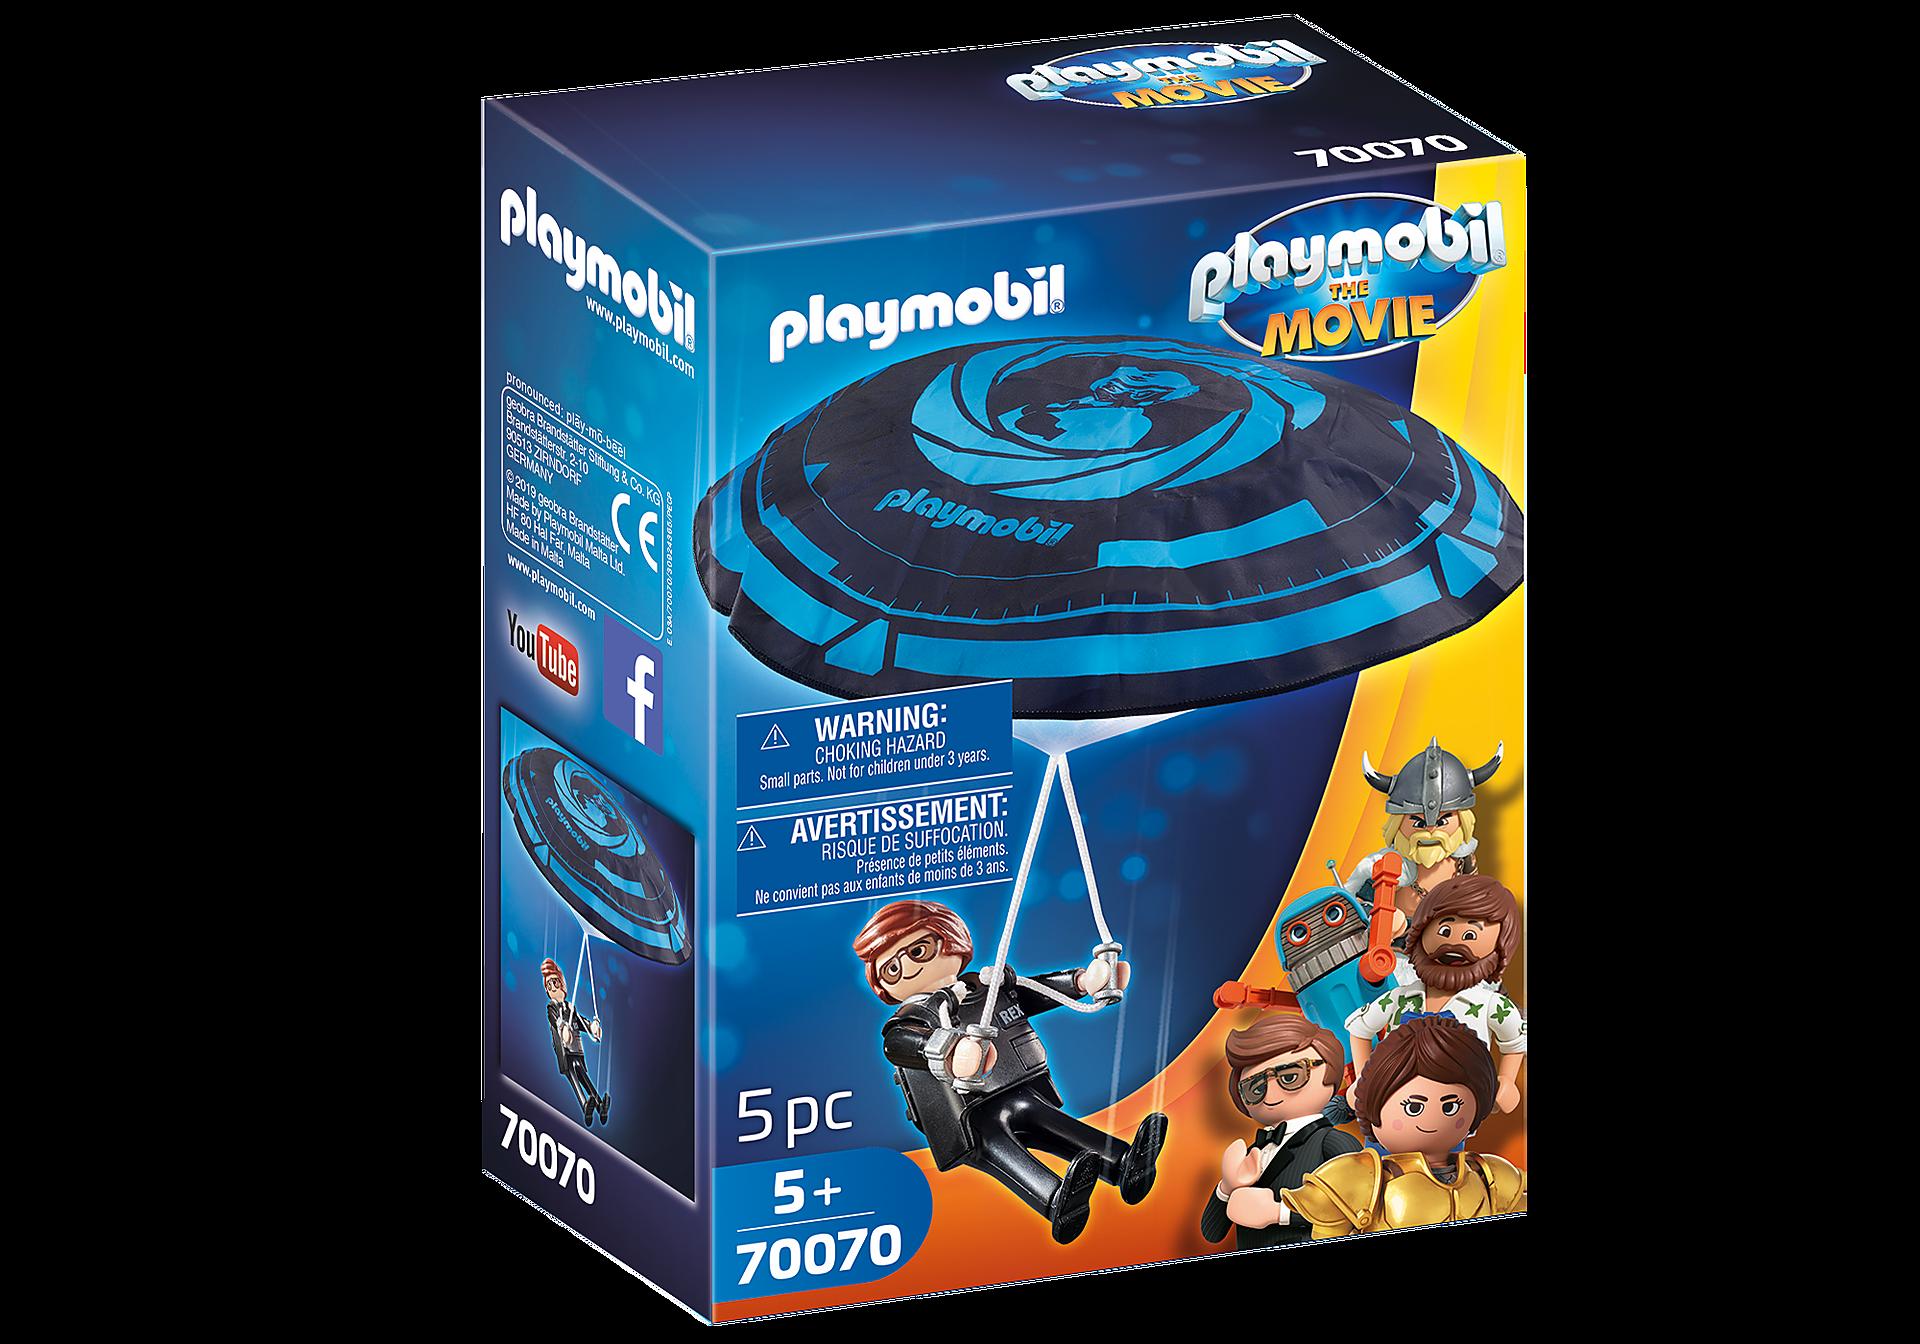 http://media.playmobil.com/i/playmobil/70070_product_box_front/PLAYMOBIL: THE MOVIE Rex Dasher con Paracaídas